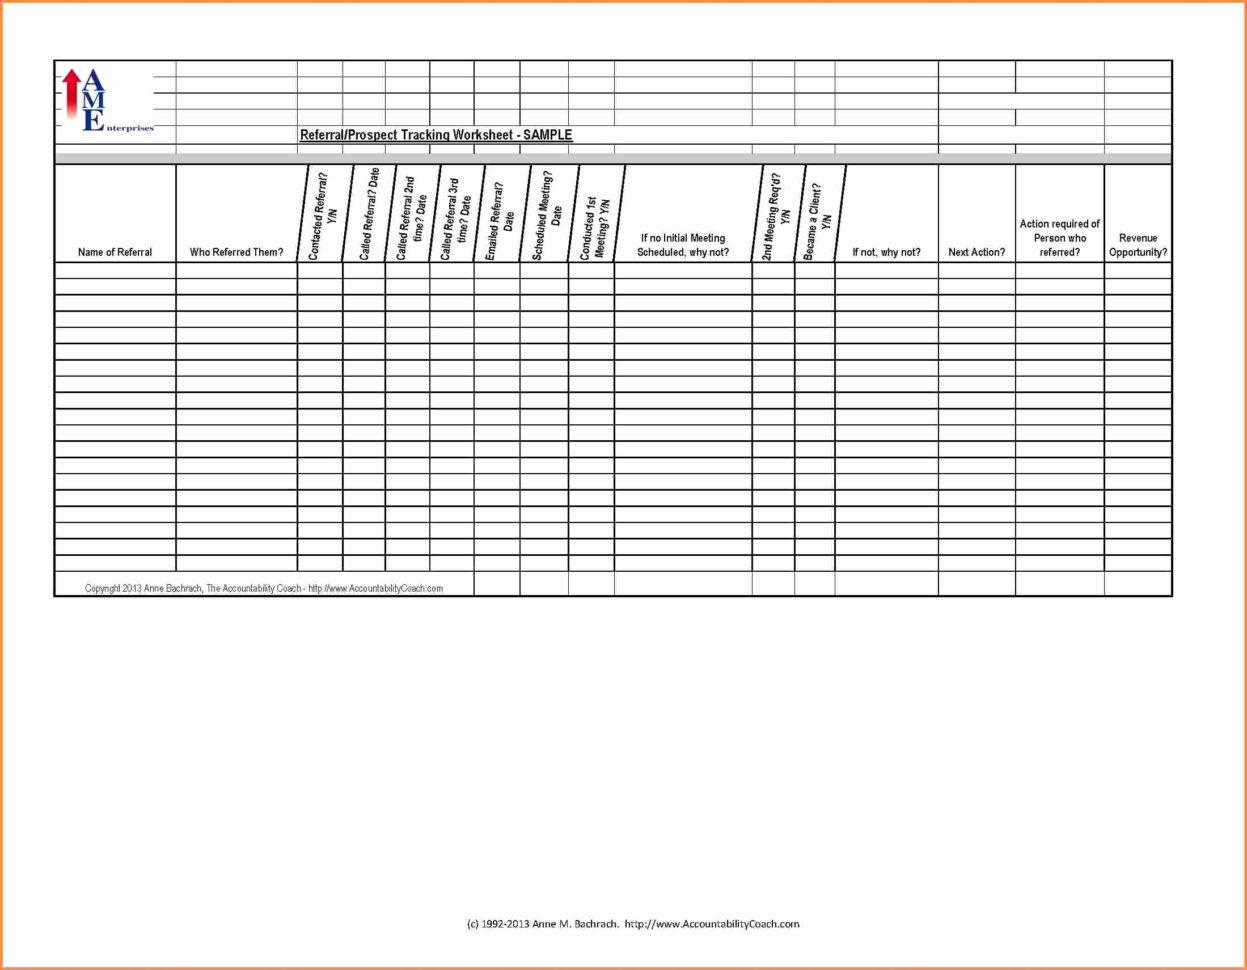 Vending Machine Inventory Spreadsheet Elegant 50 Beautiful